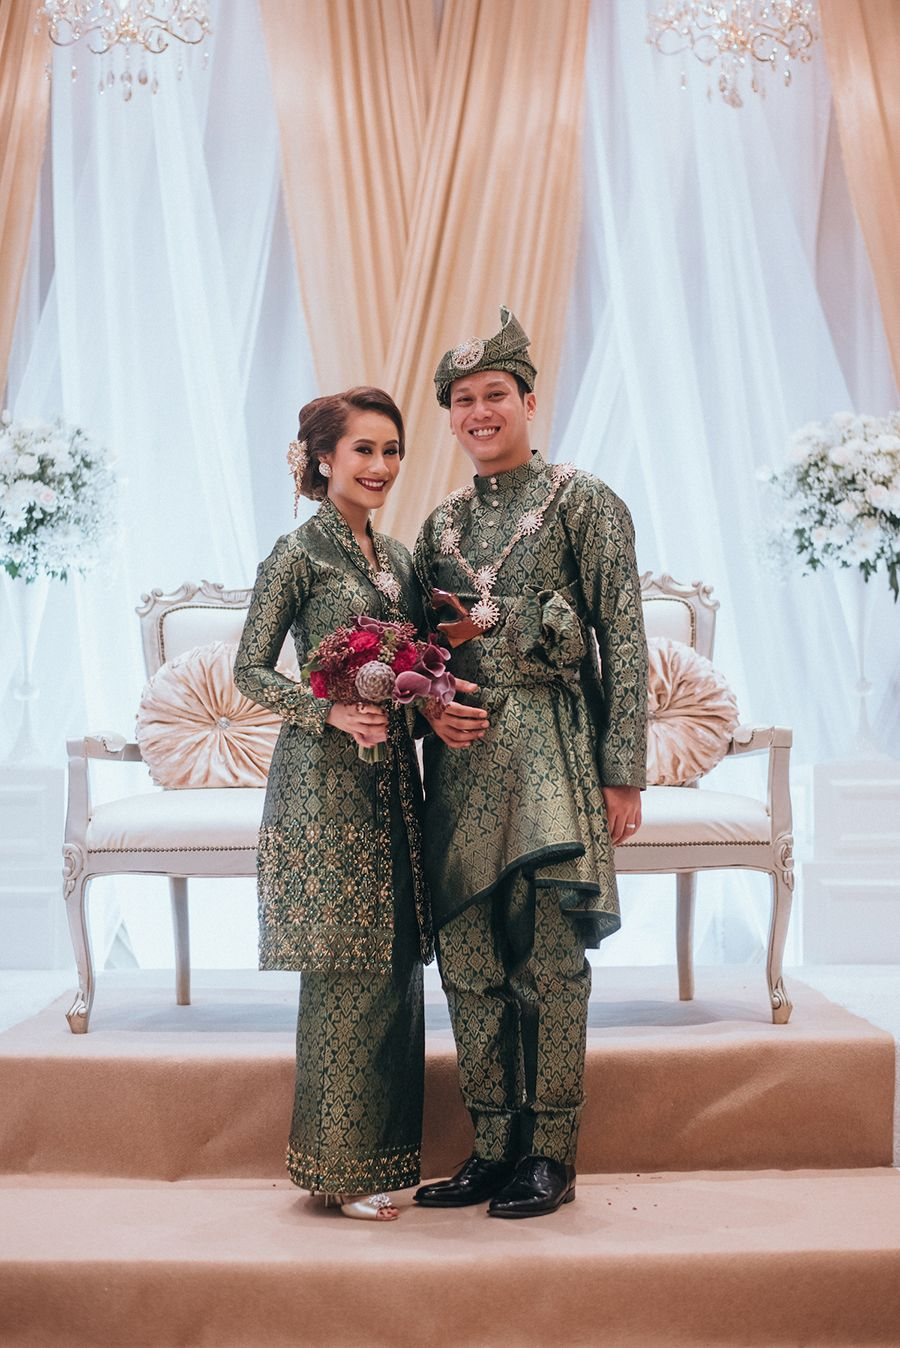 Razif and Sarah's Wedding at The Grassroots' Club | Green wedding dresses,  Traditional wedding attire, Minimal wedding dress